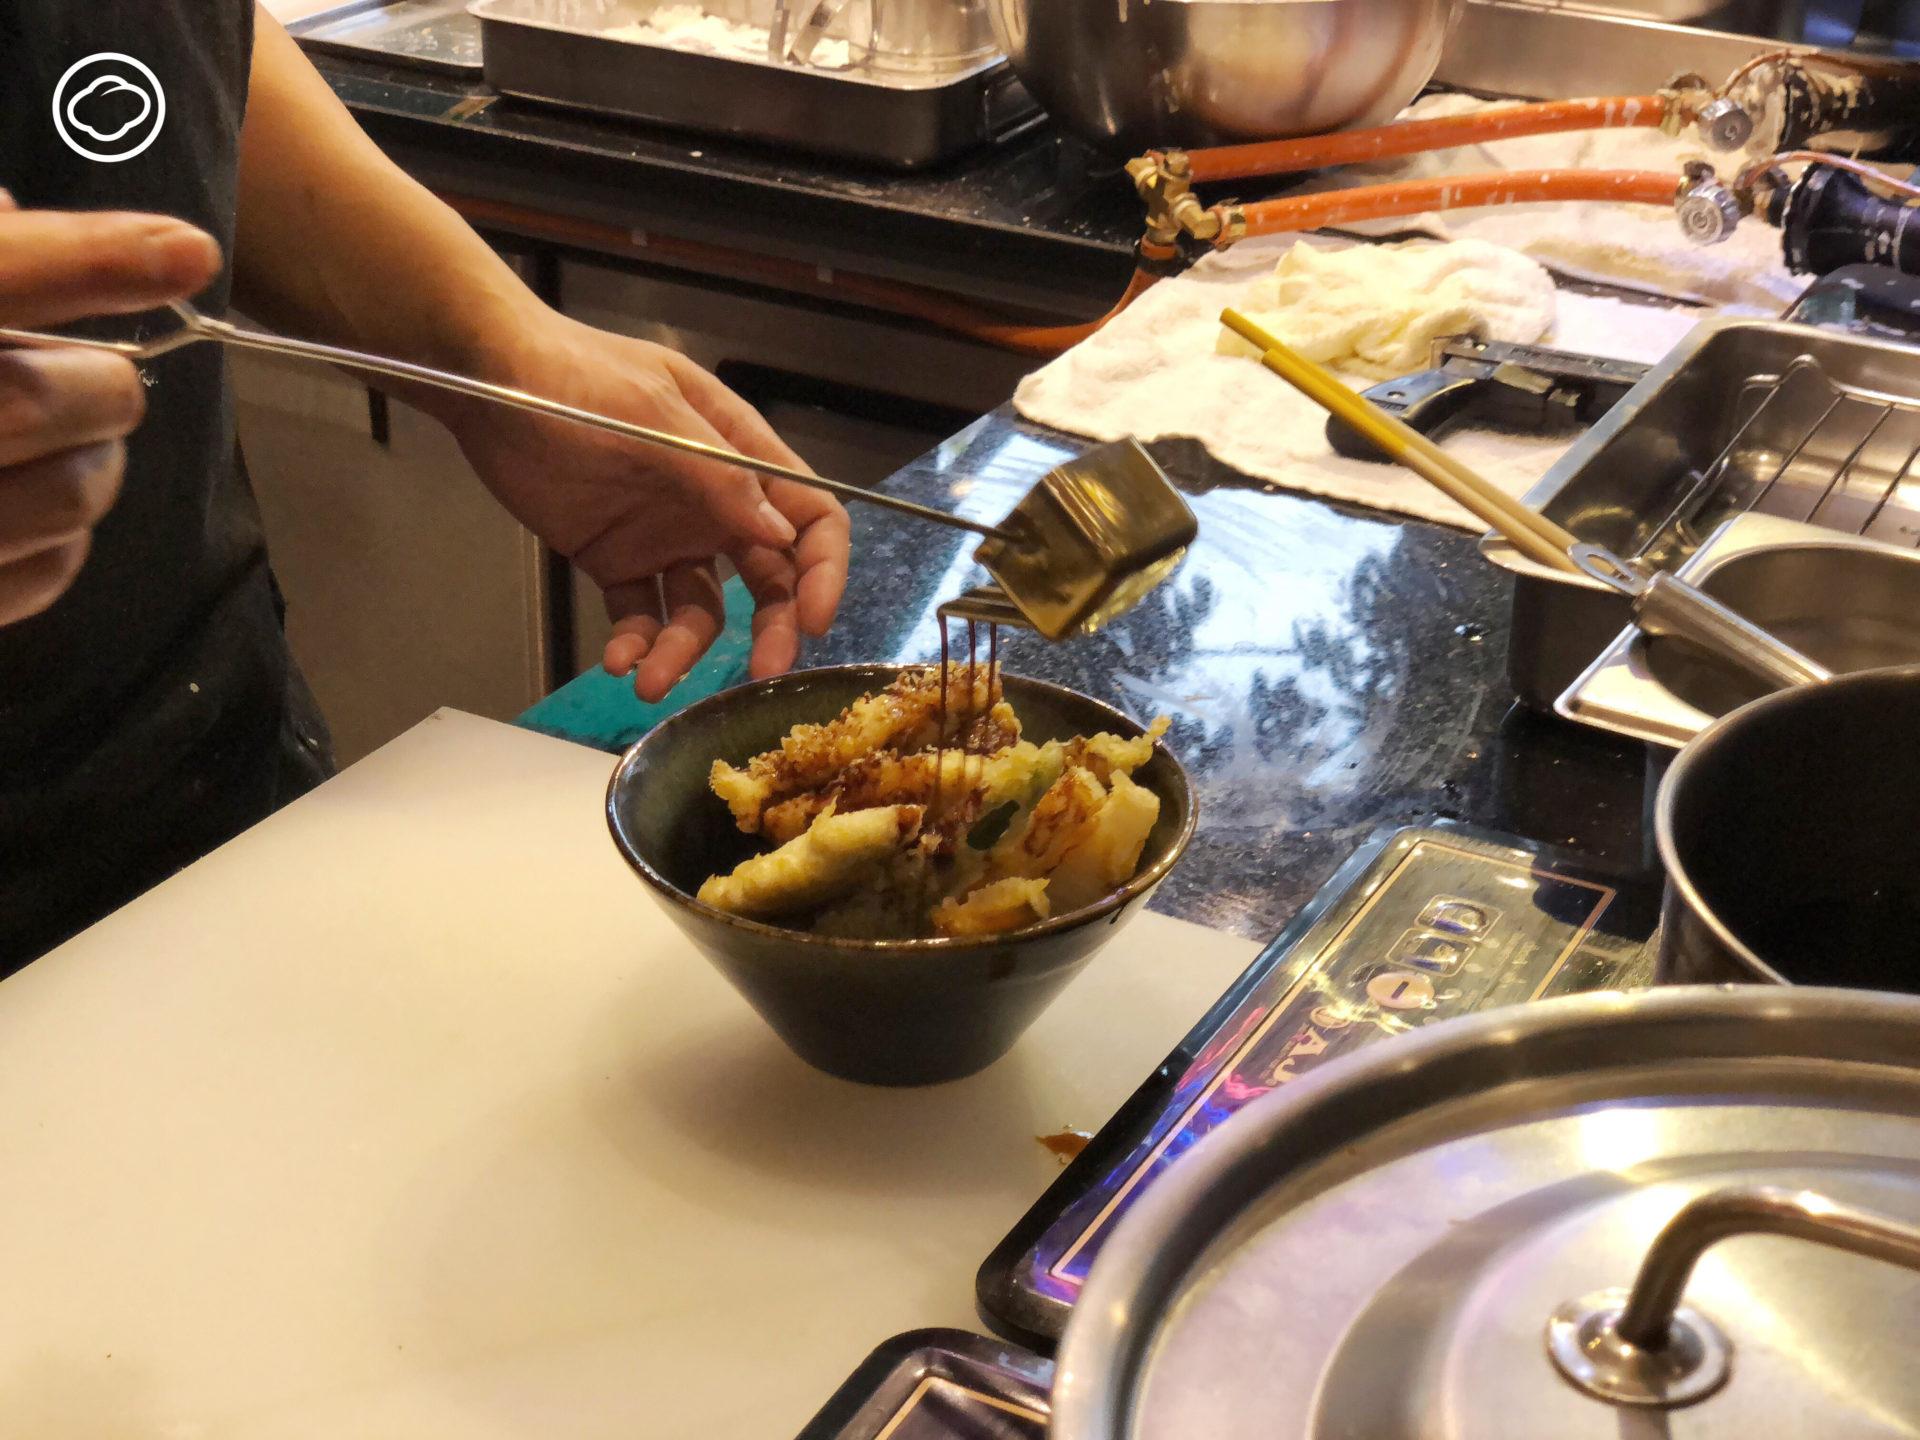 BATT, ร้านเทมปุระ, ร้านอาหารญี่ปุ่น, ร้านอาหาร เจริญกรุง,BATT batter temperature & tempura